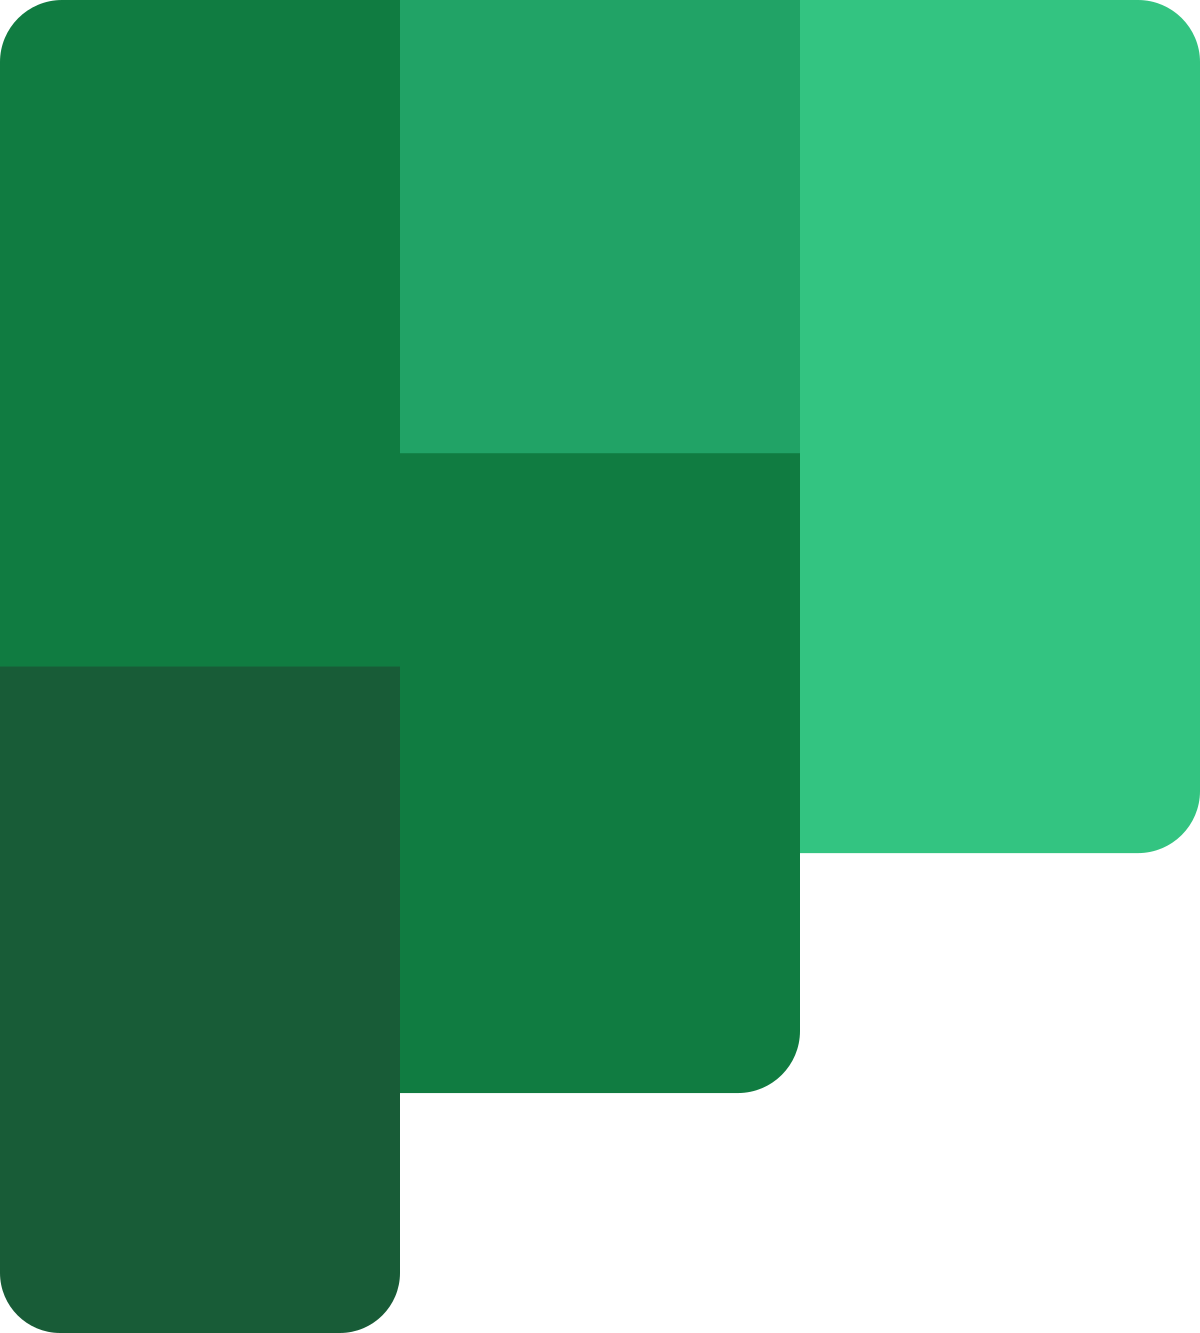 Planner (Office 365)